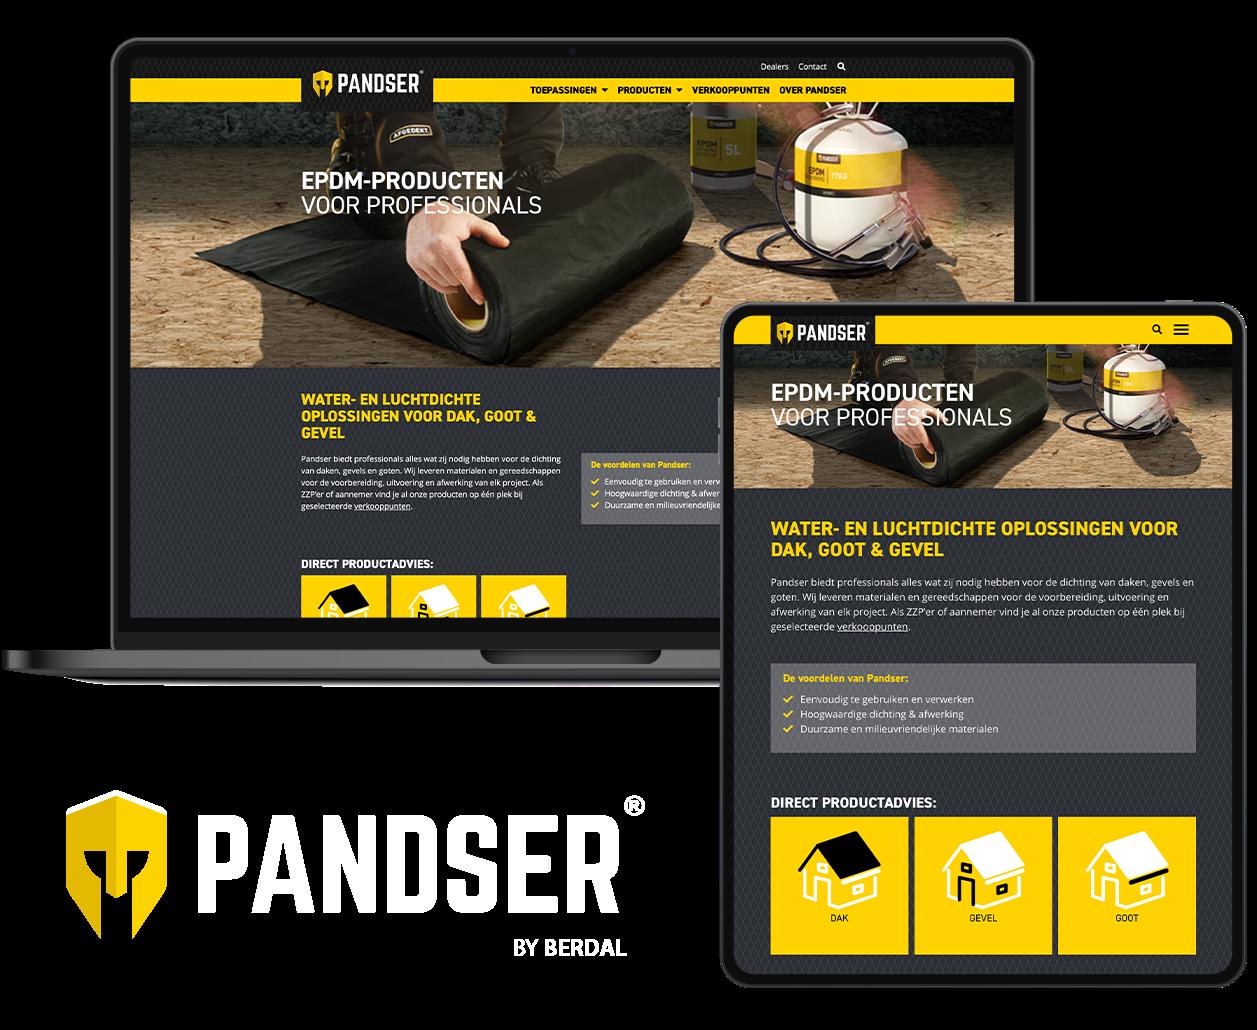 Pandser website